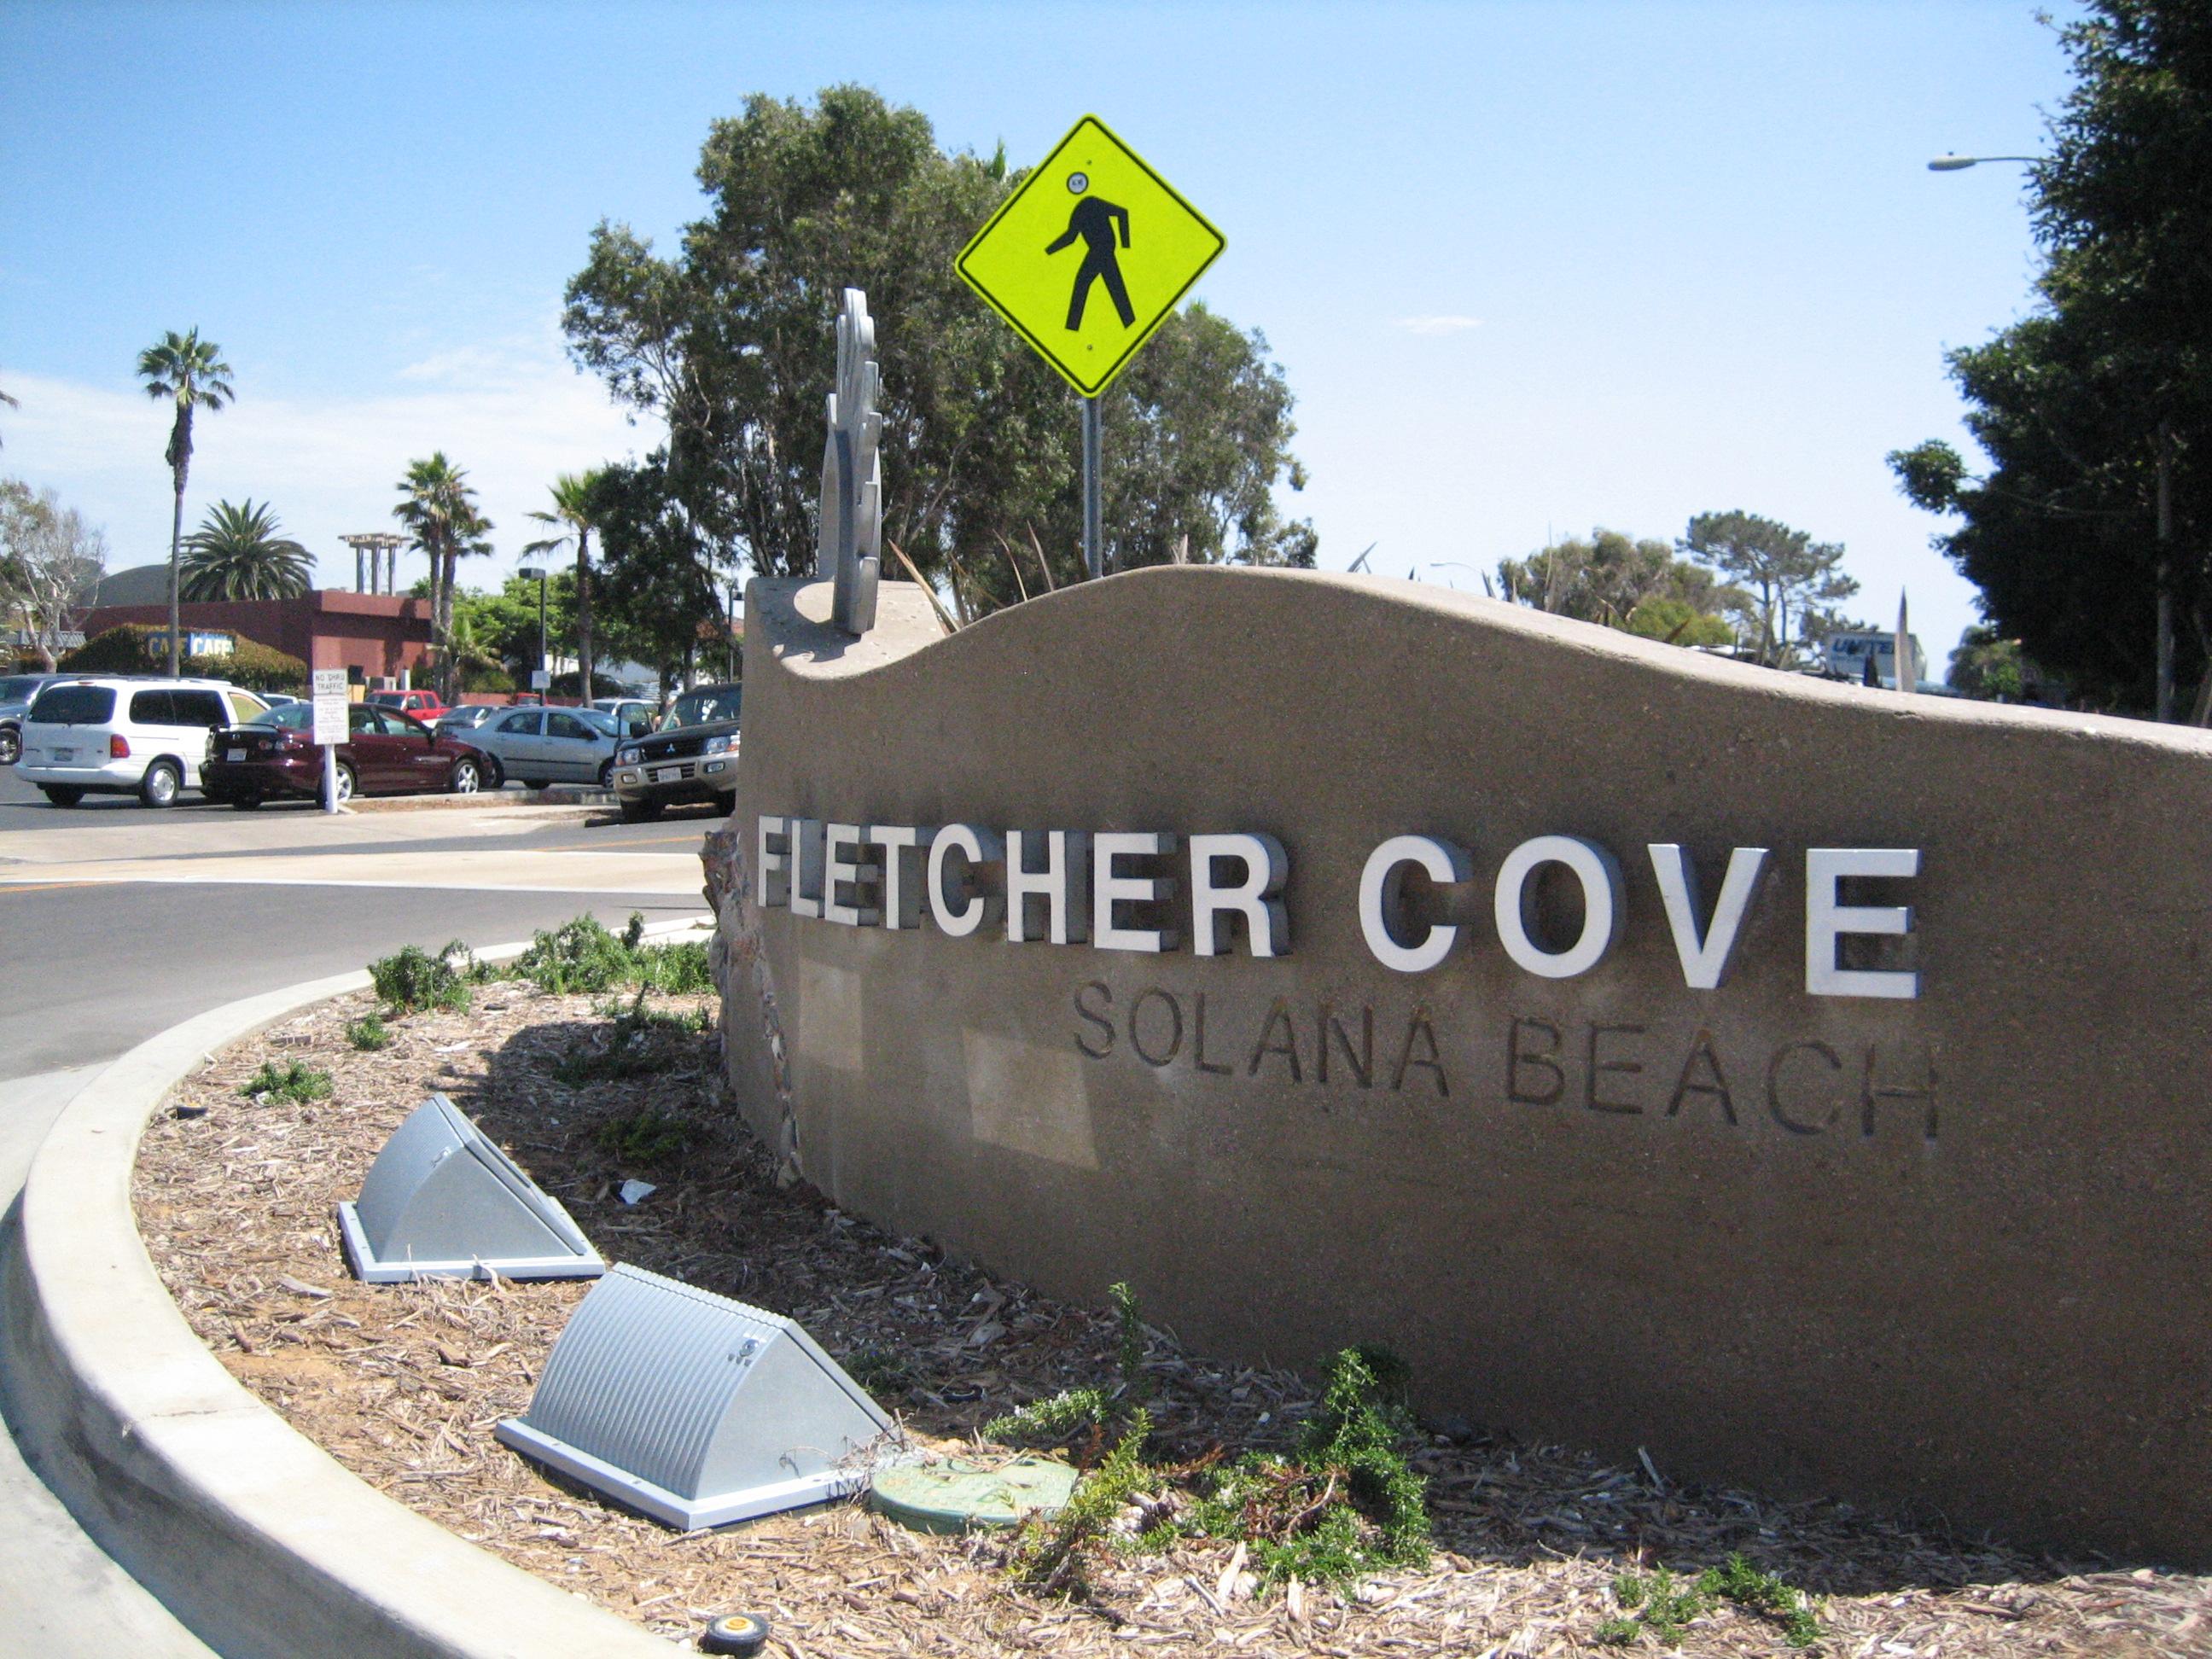 Fletcher Cove Sierra Pacific West